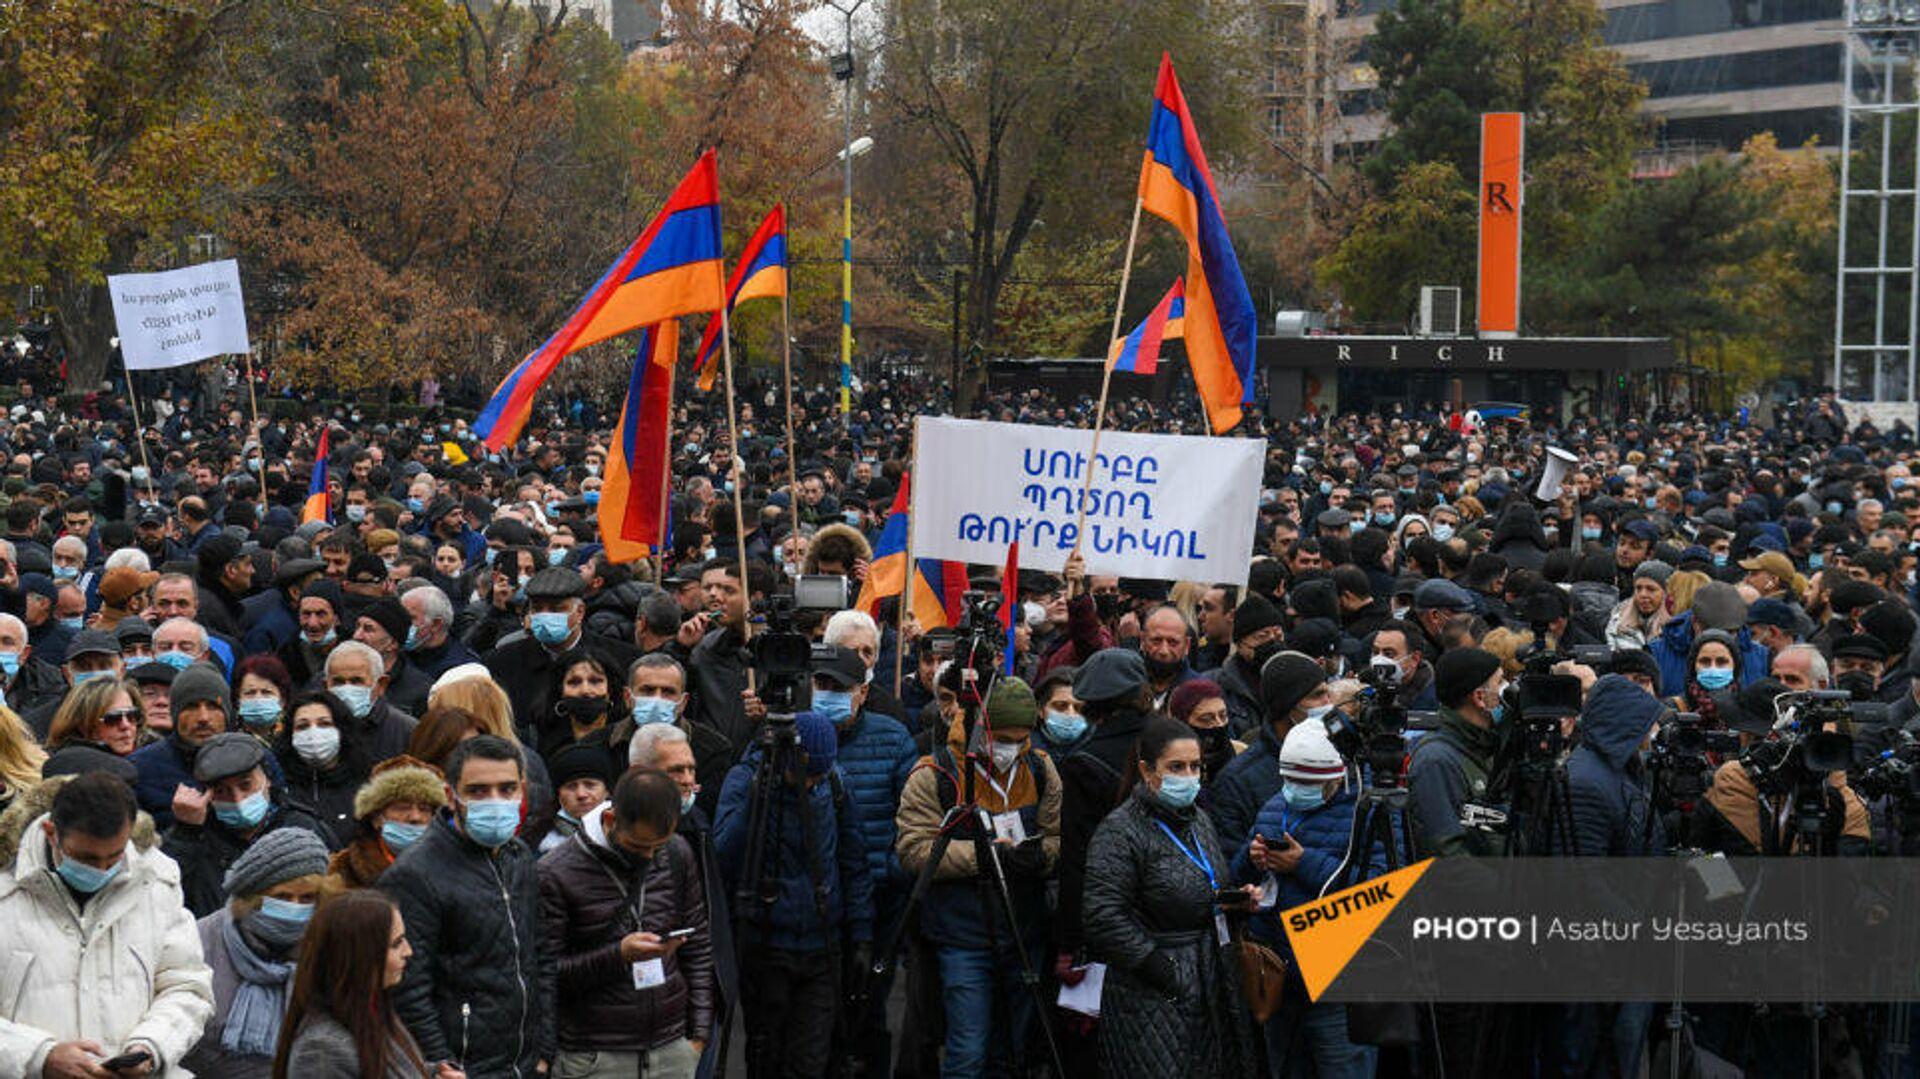 Участники акции протеста оппозиции в Ереване. 5 декабря 2020 - РИА Новости, 1920, 05.12.2020